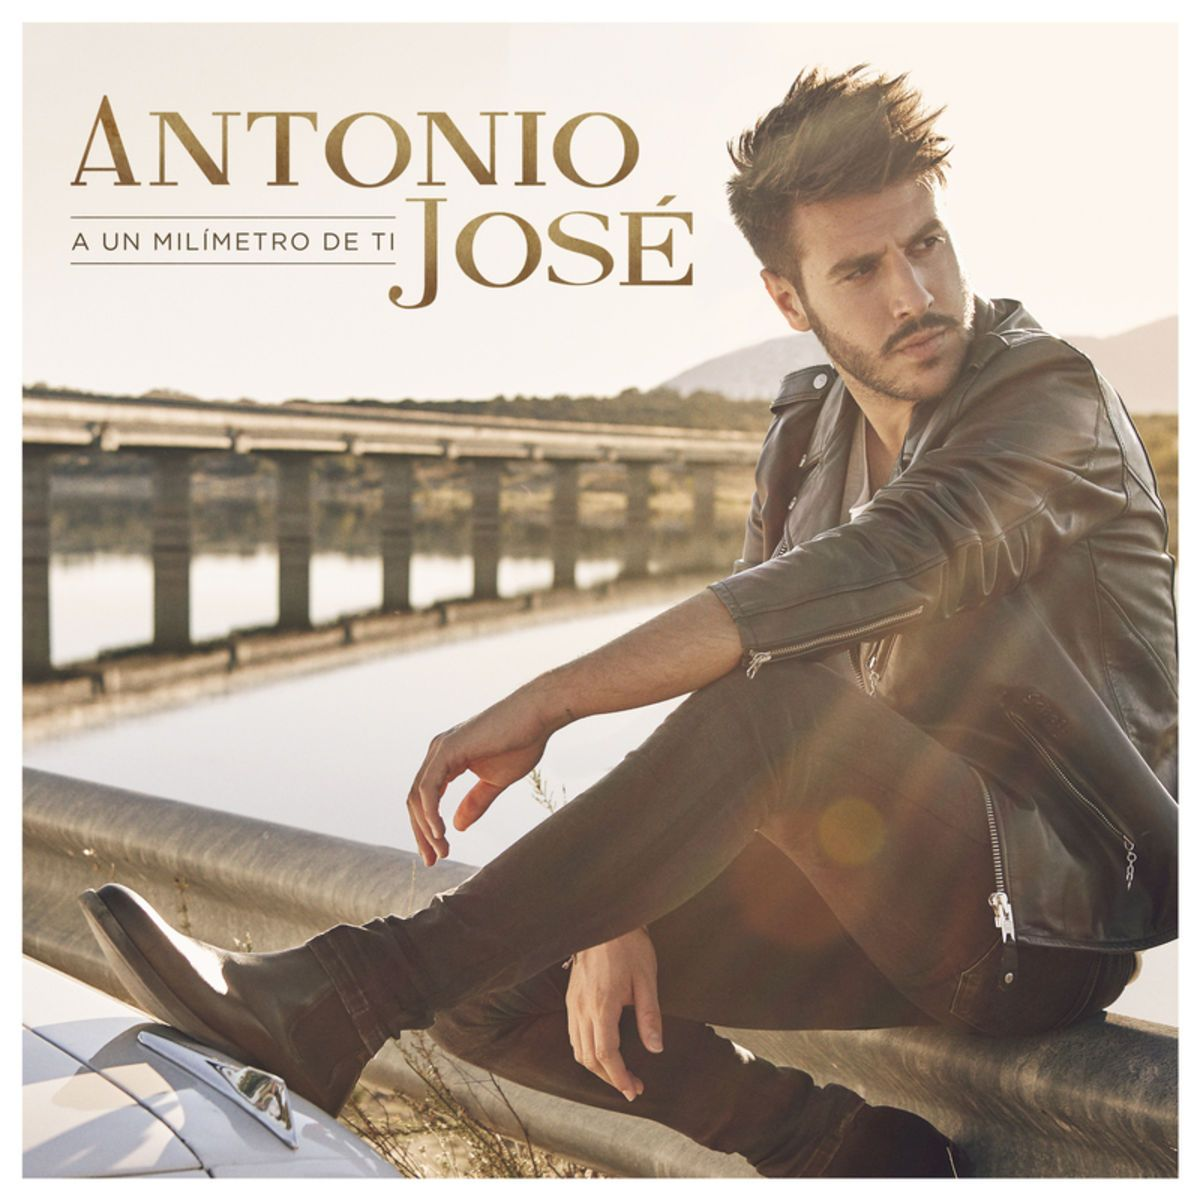 Antonio José - A Un Milímetro De Ti album cover